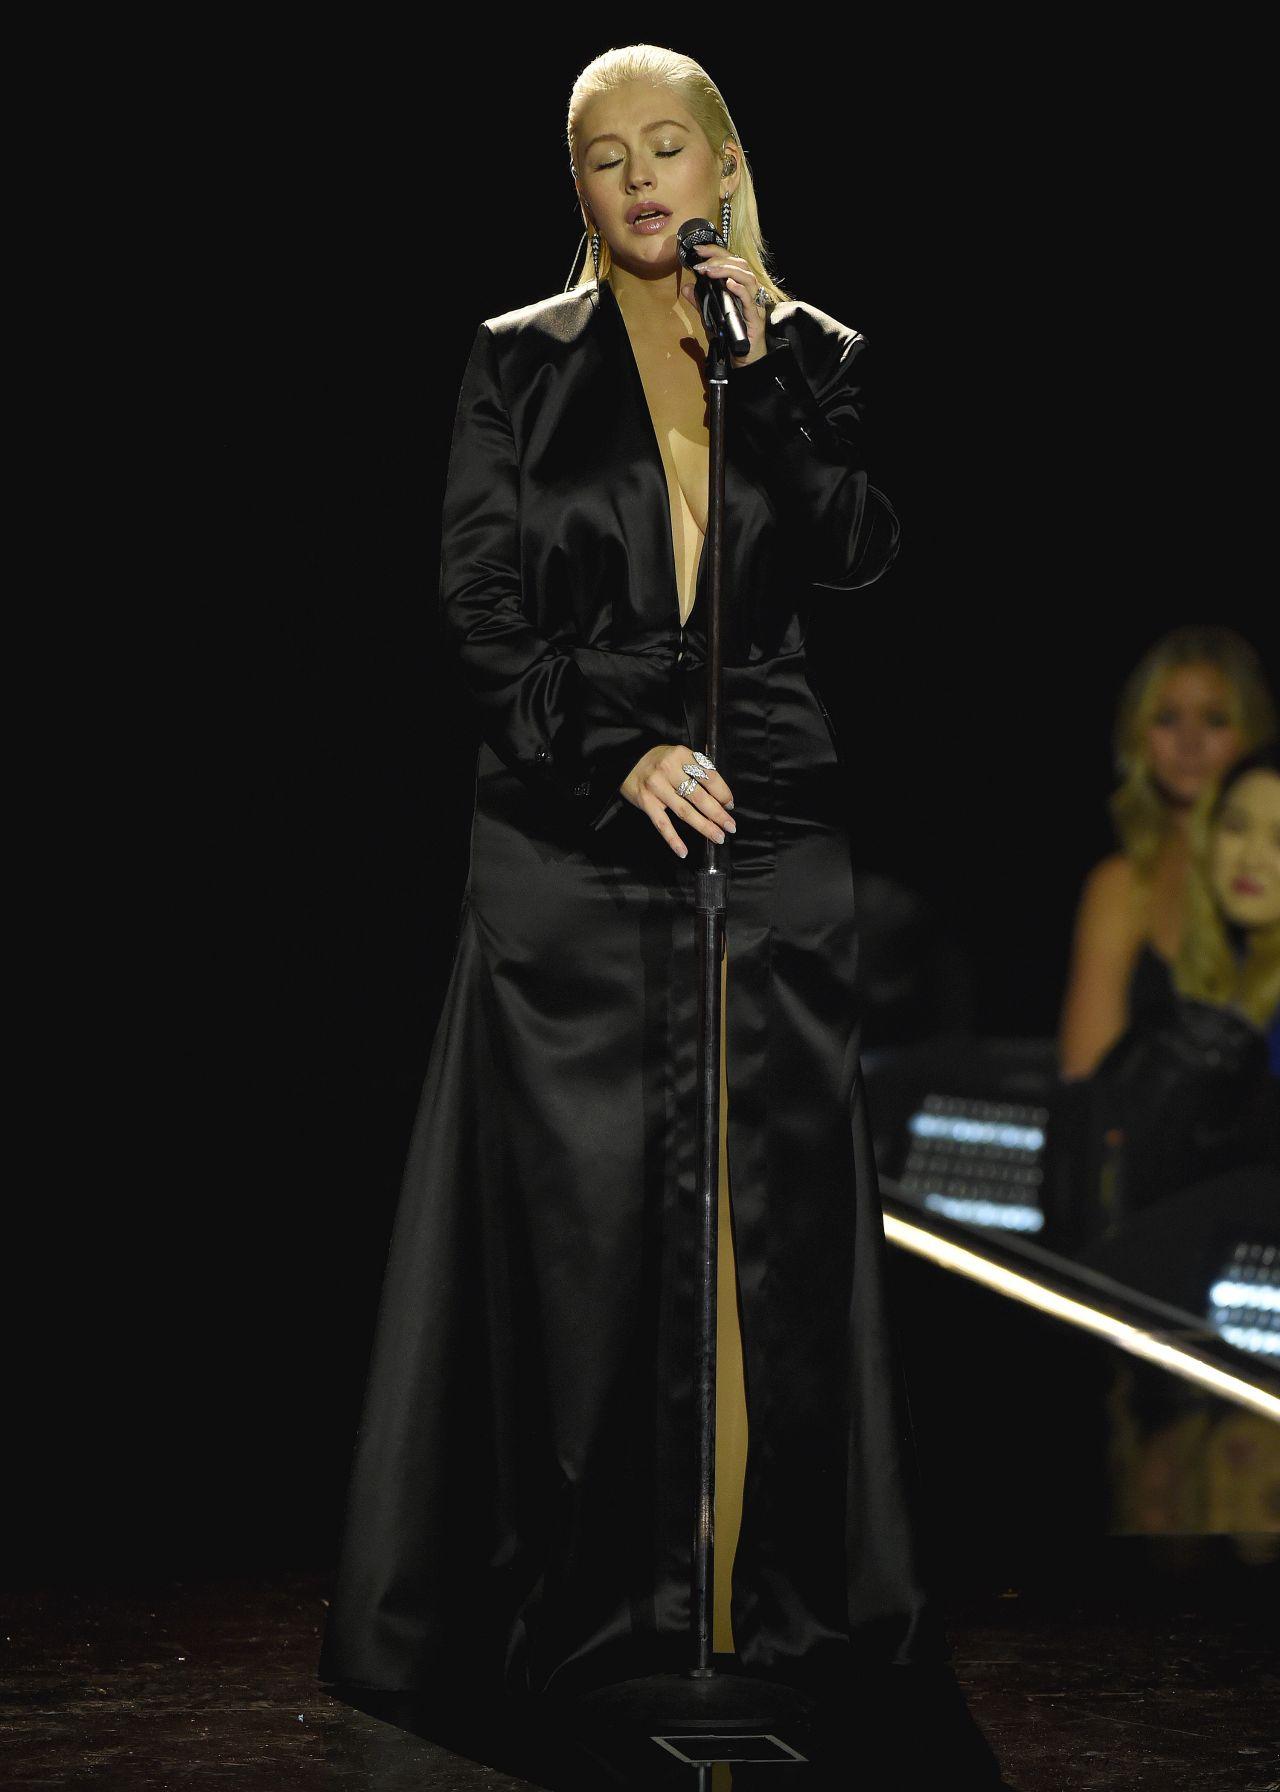 http://celebmafia.com/wp-content/uploads/2017/11/christina-aguilera-performs-live-at-the-2017-american-music-awards-in-la-4.jpg